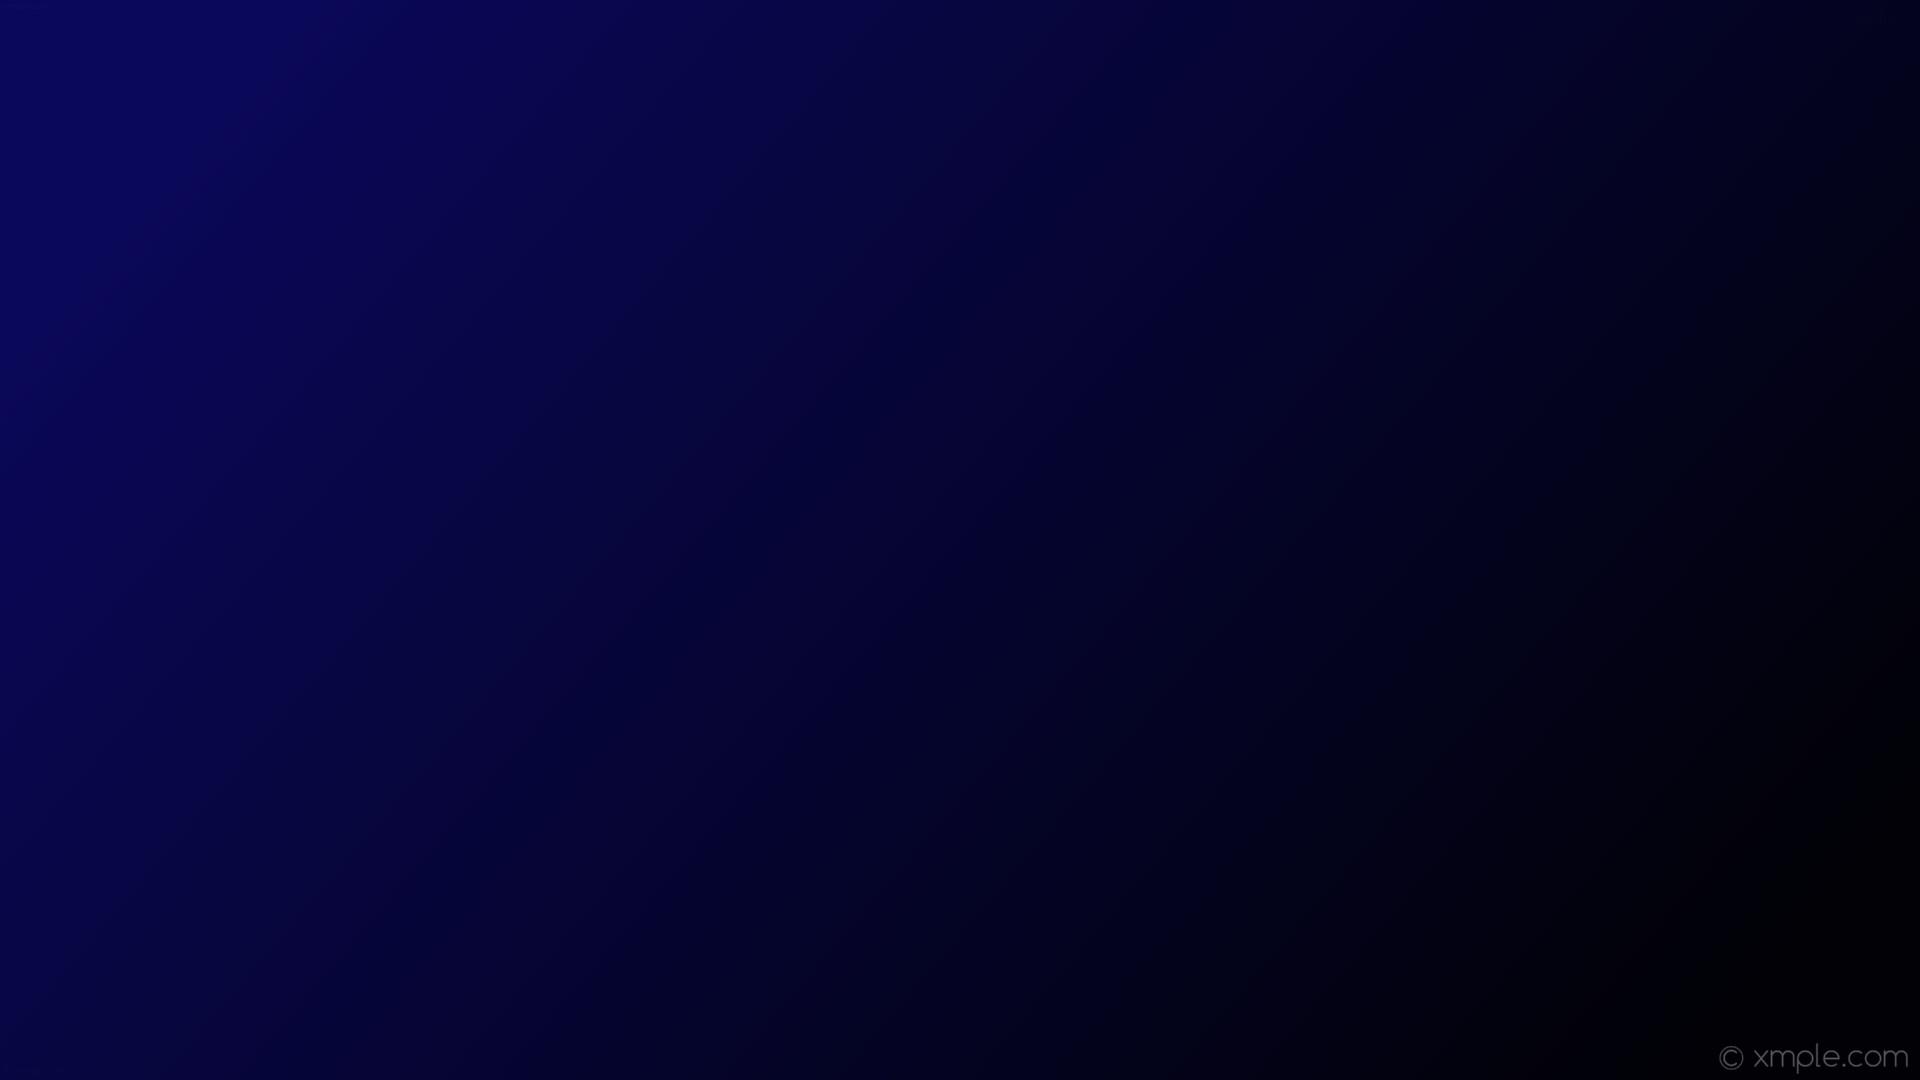 Res: 1920x1080, wallpaper black linear blue gradient dark blue #0a085b #010106 165°